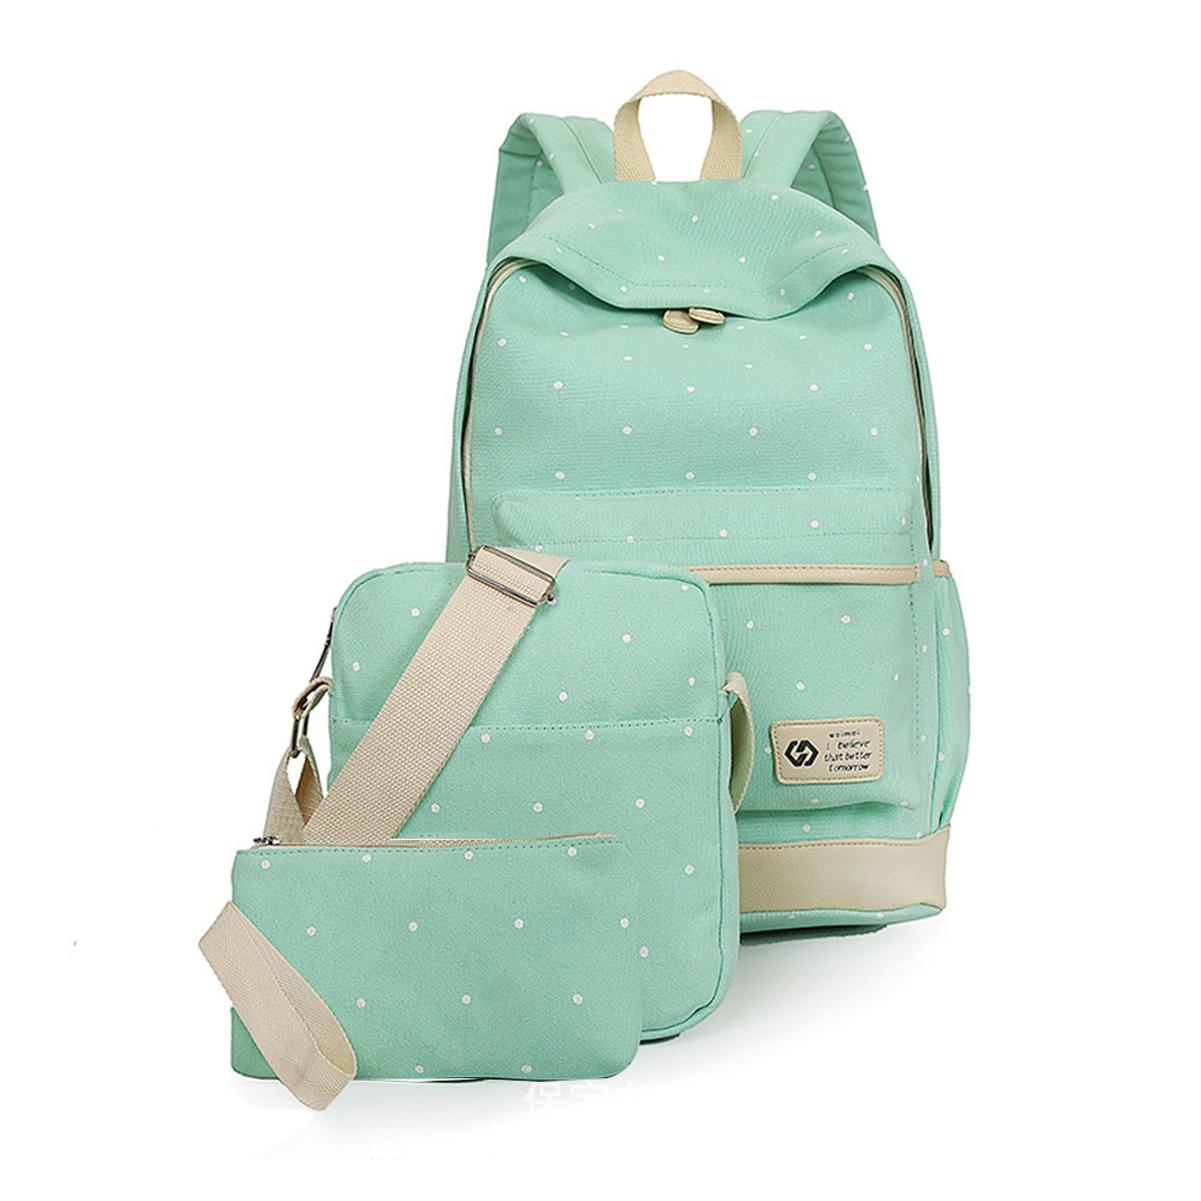 Fashionwu Casual Lightweight Rucksack Canvas Wallet/Shoulder Bag/School Backpack Dot Set Green